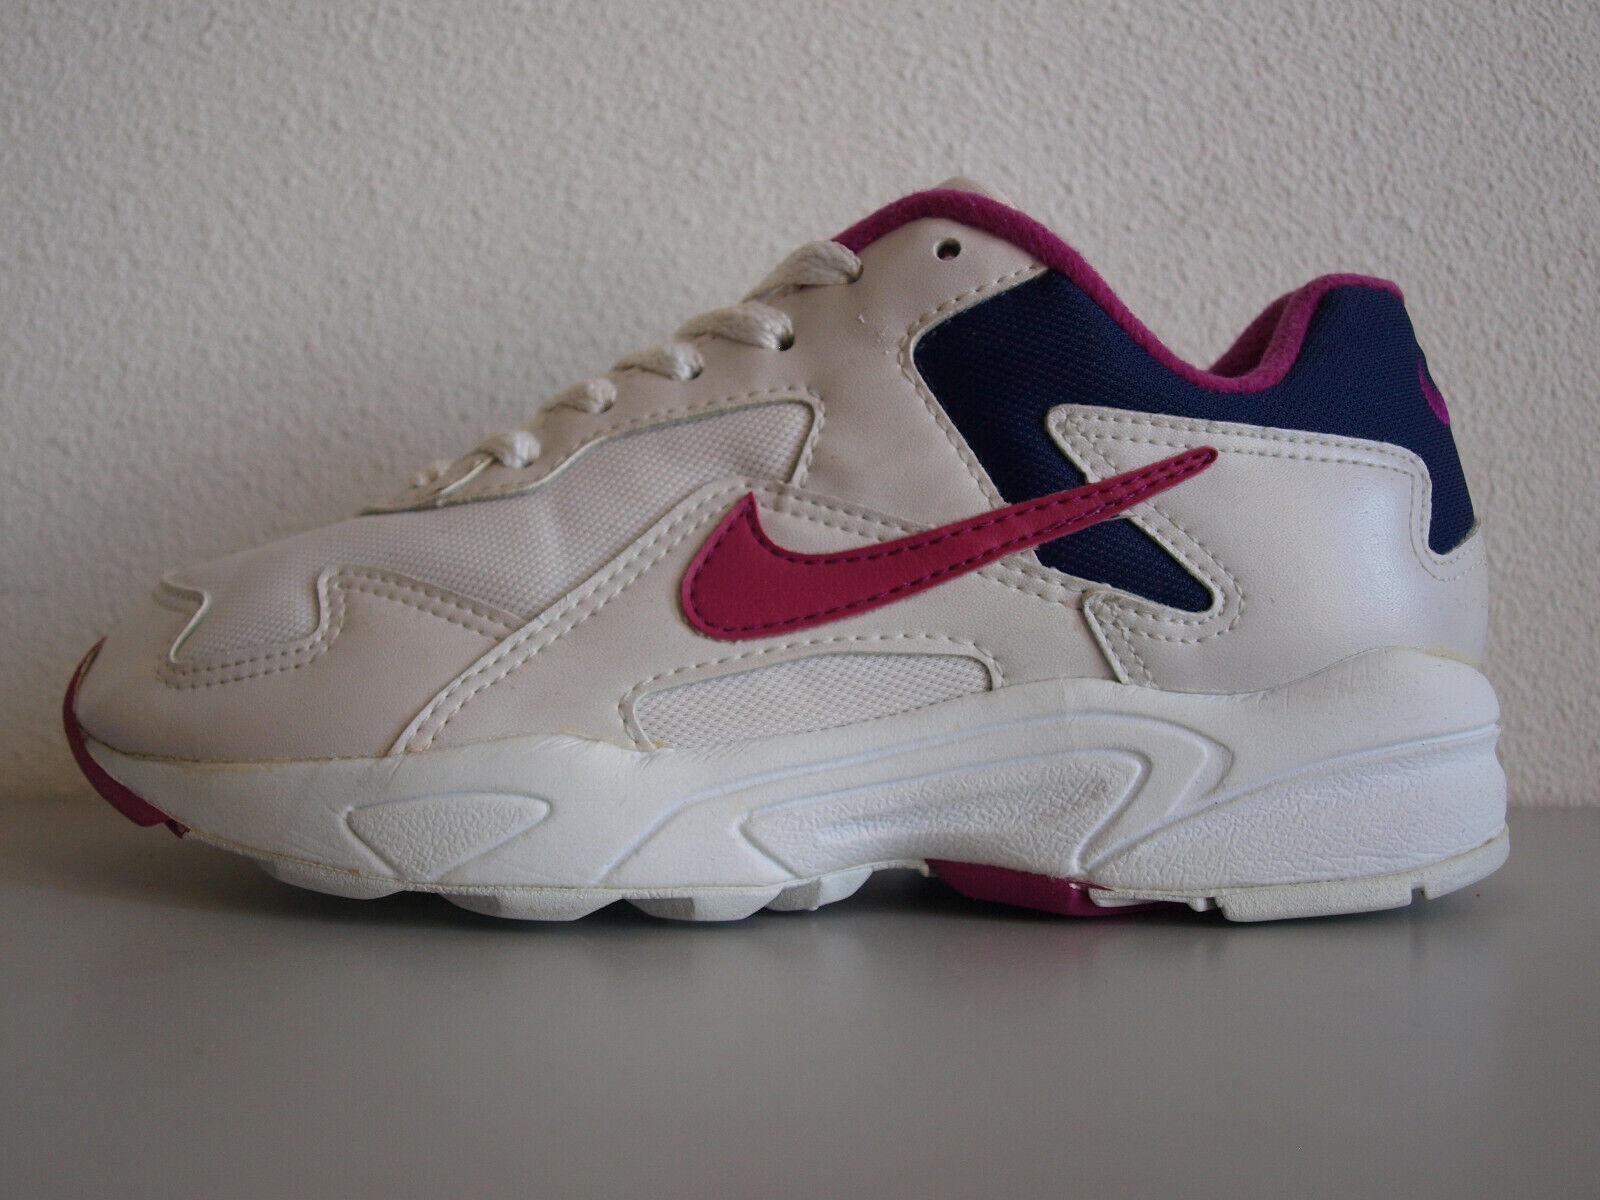 Nike Predon 1994 Vintage US WMNS 6.5 UK 4 Eur 37.5 Air Max Span Base OG 1 90 180